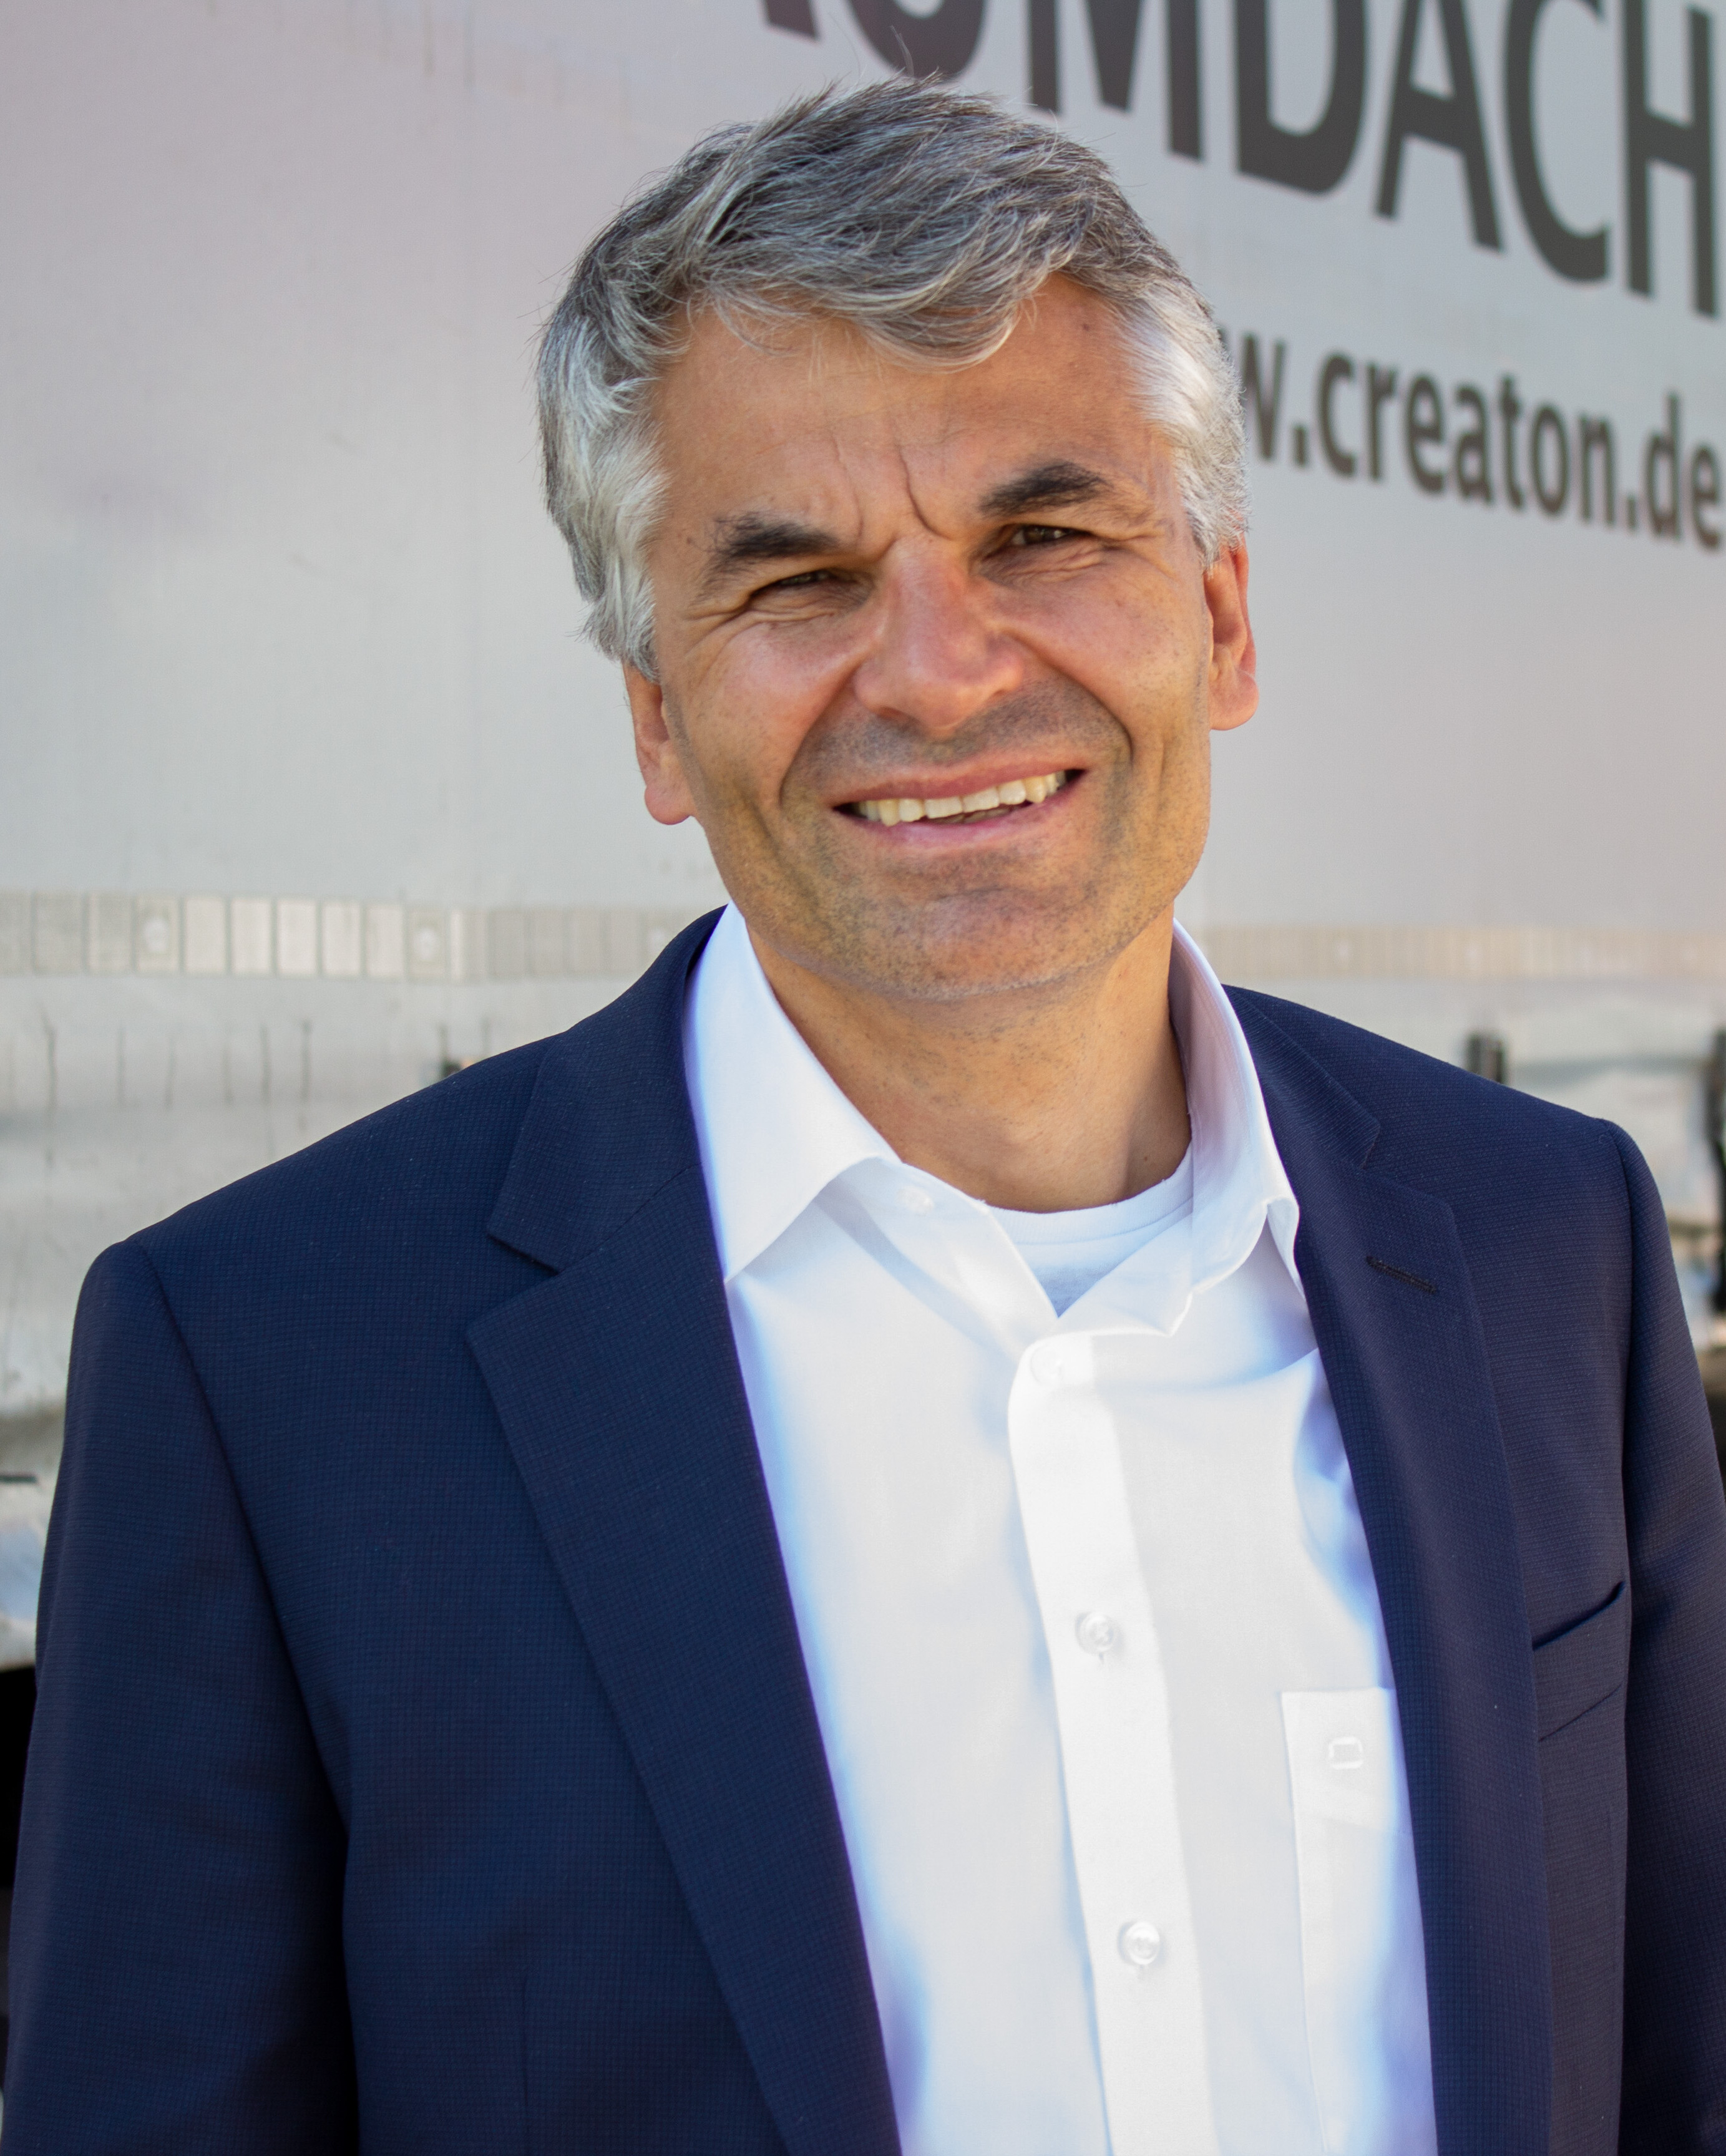 Dr. Sebastian Dresse, Geschäftsführer der Creaton GmbH (Foto: Creaton GmbH)